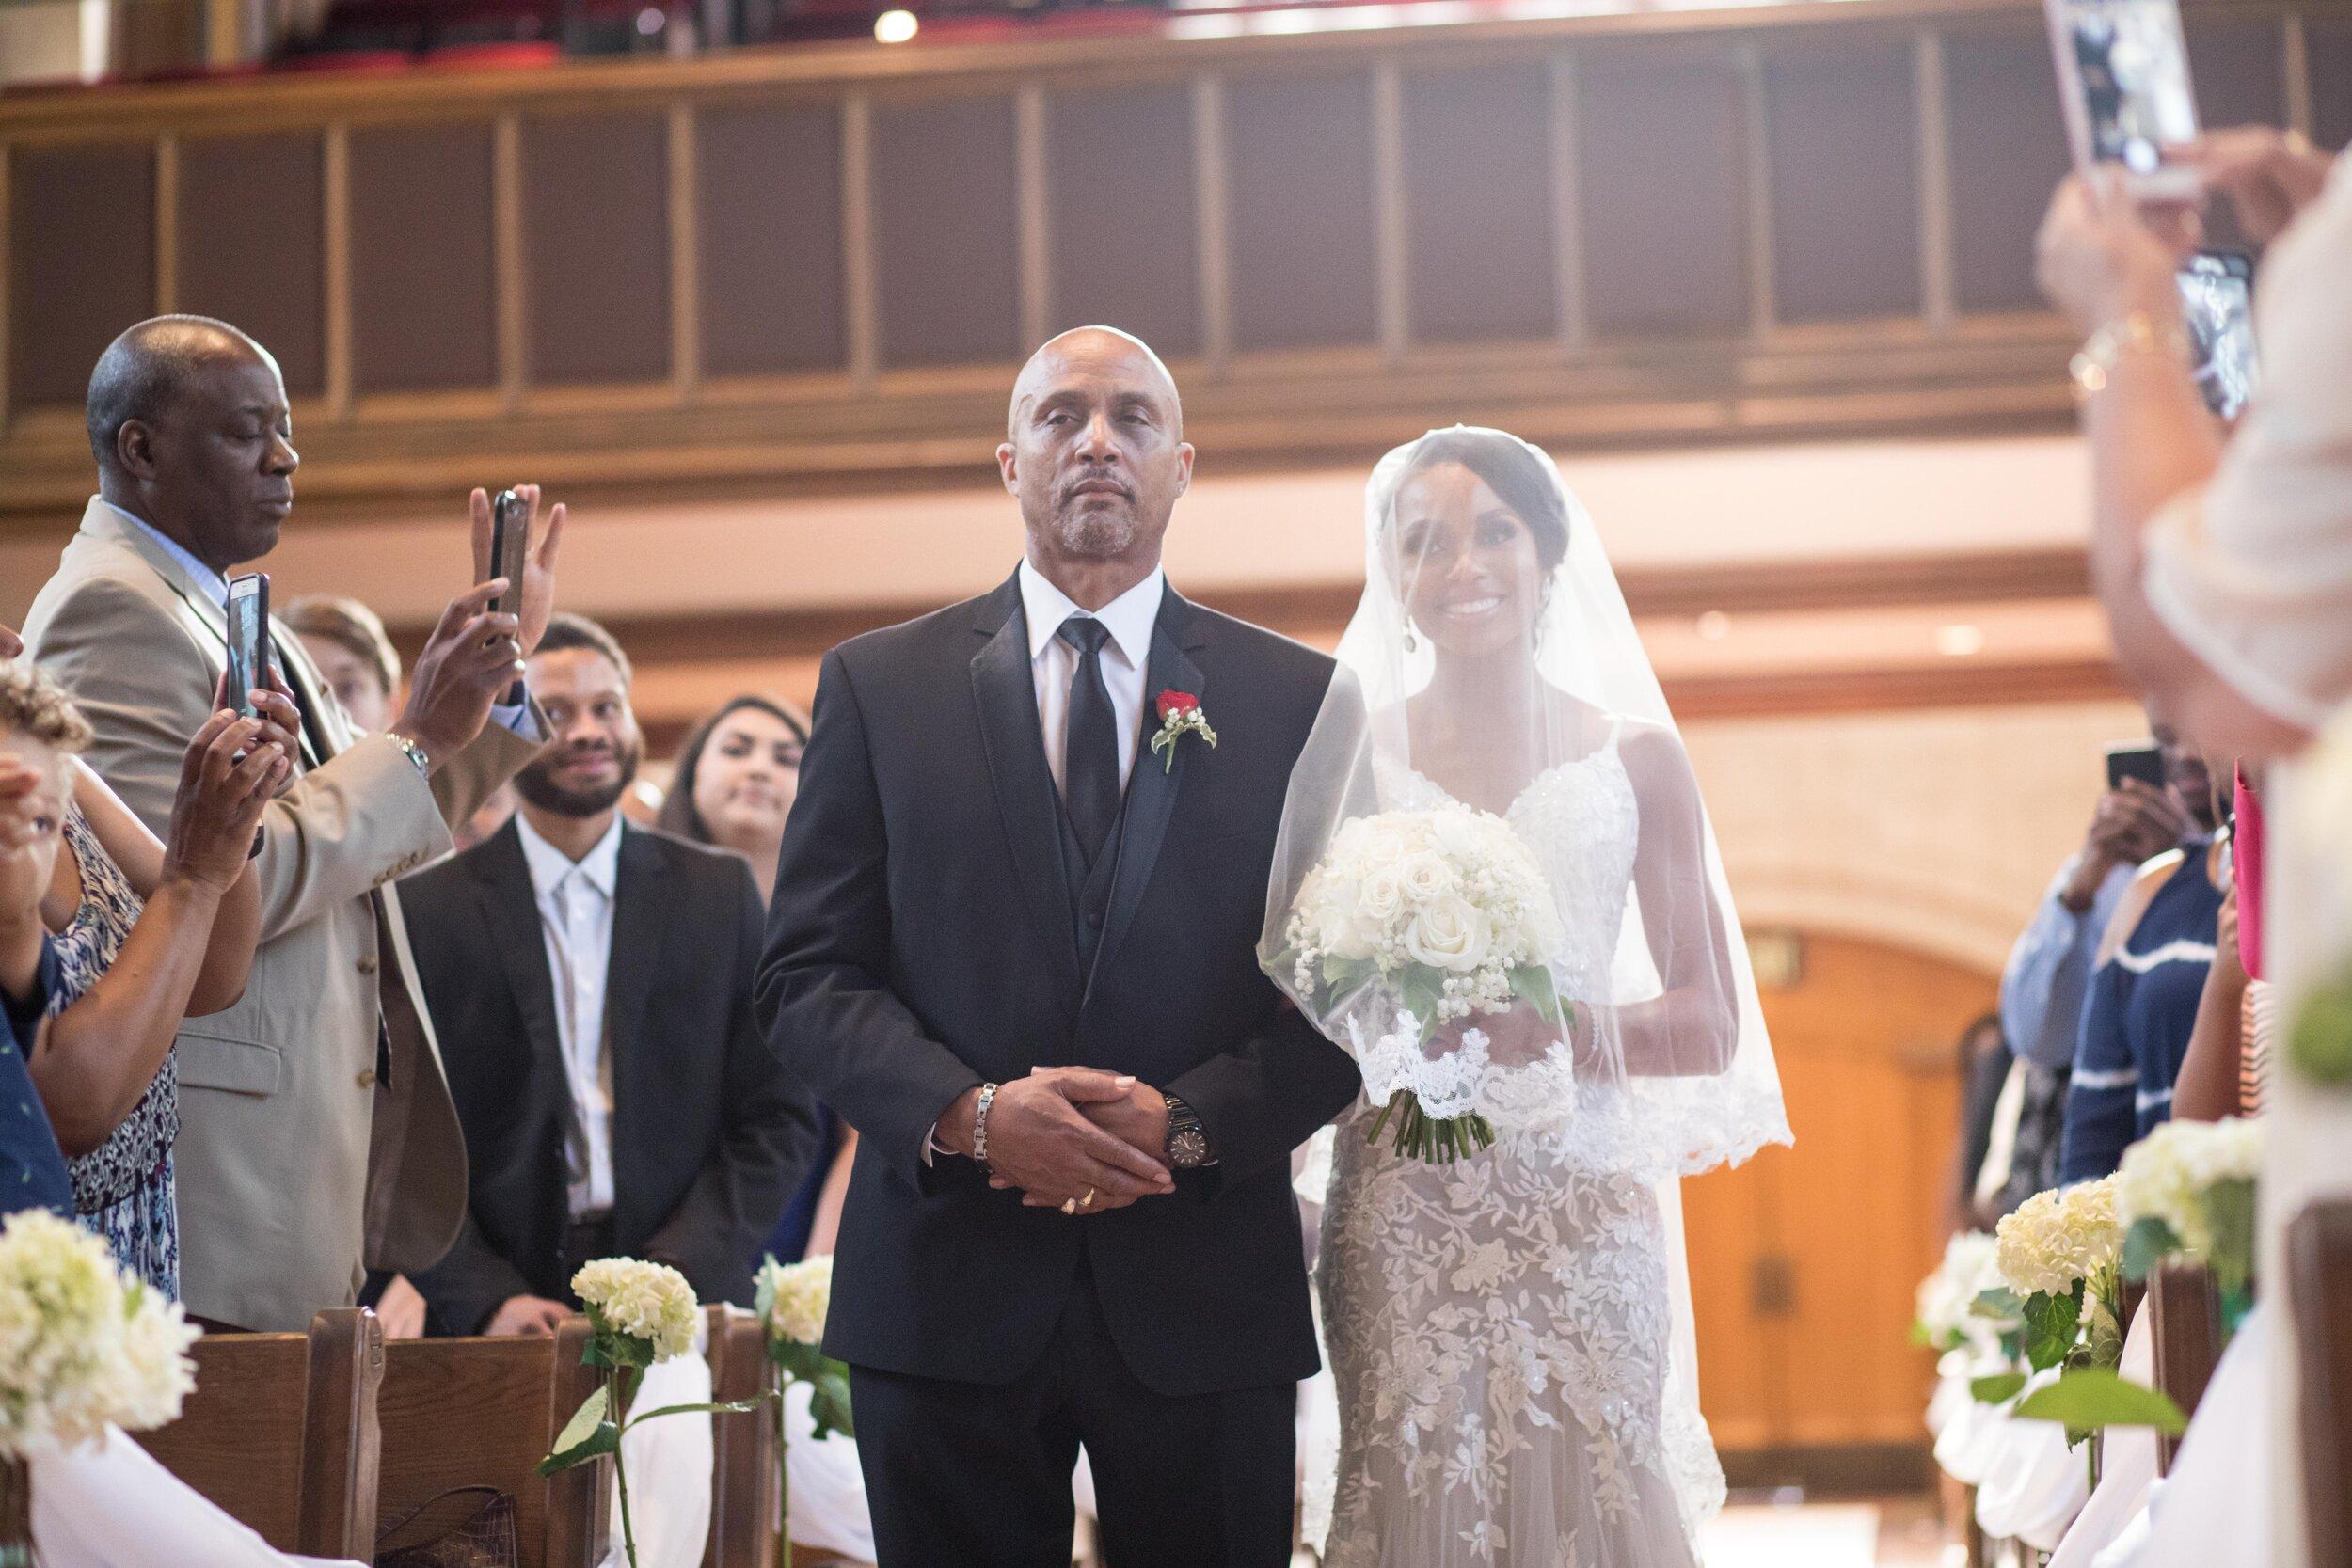 8_3_2019_BONTY_WEDDING-314.jpg